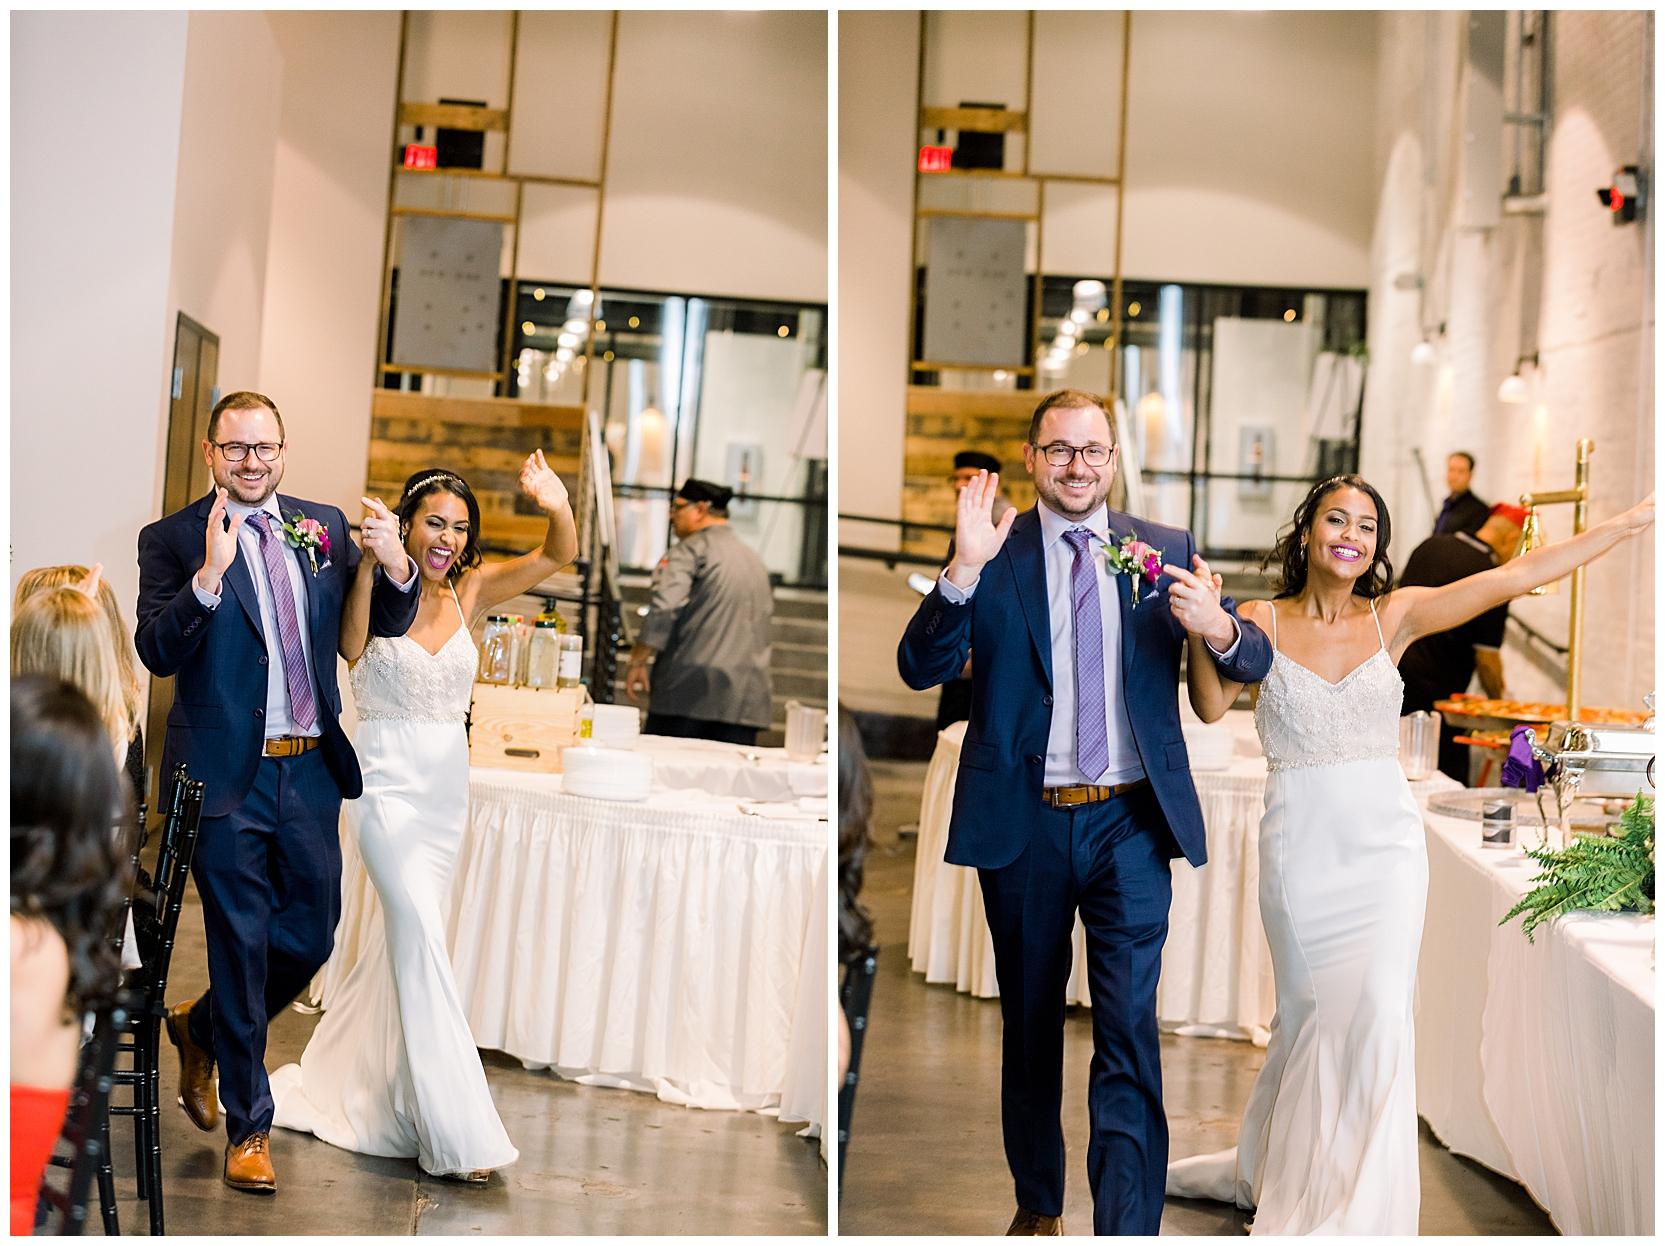 jessicafredericks_lakeland_tampa_wedding_purple_crazy hour_0069.jpg